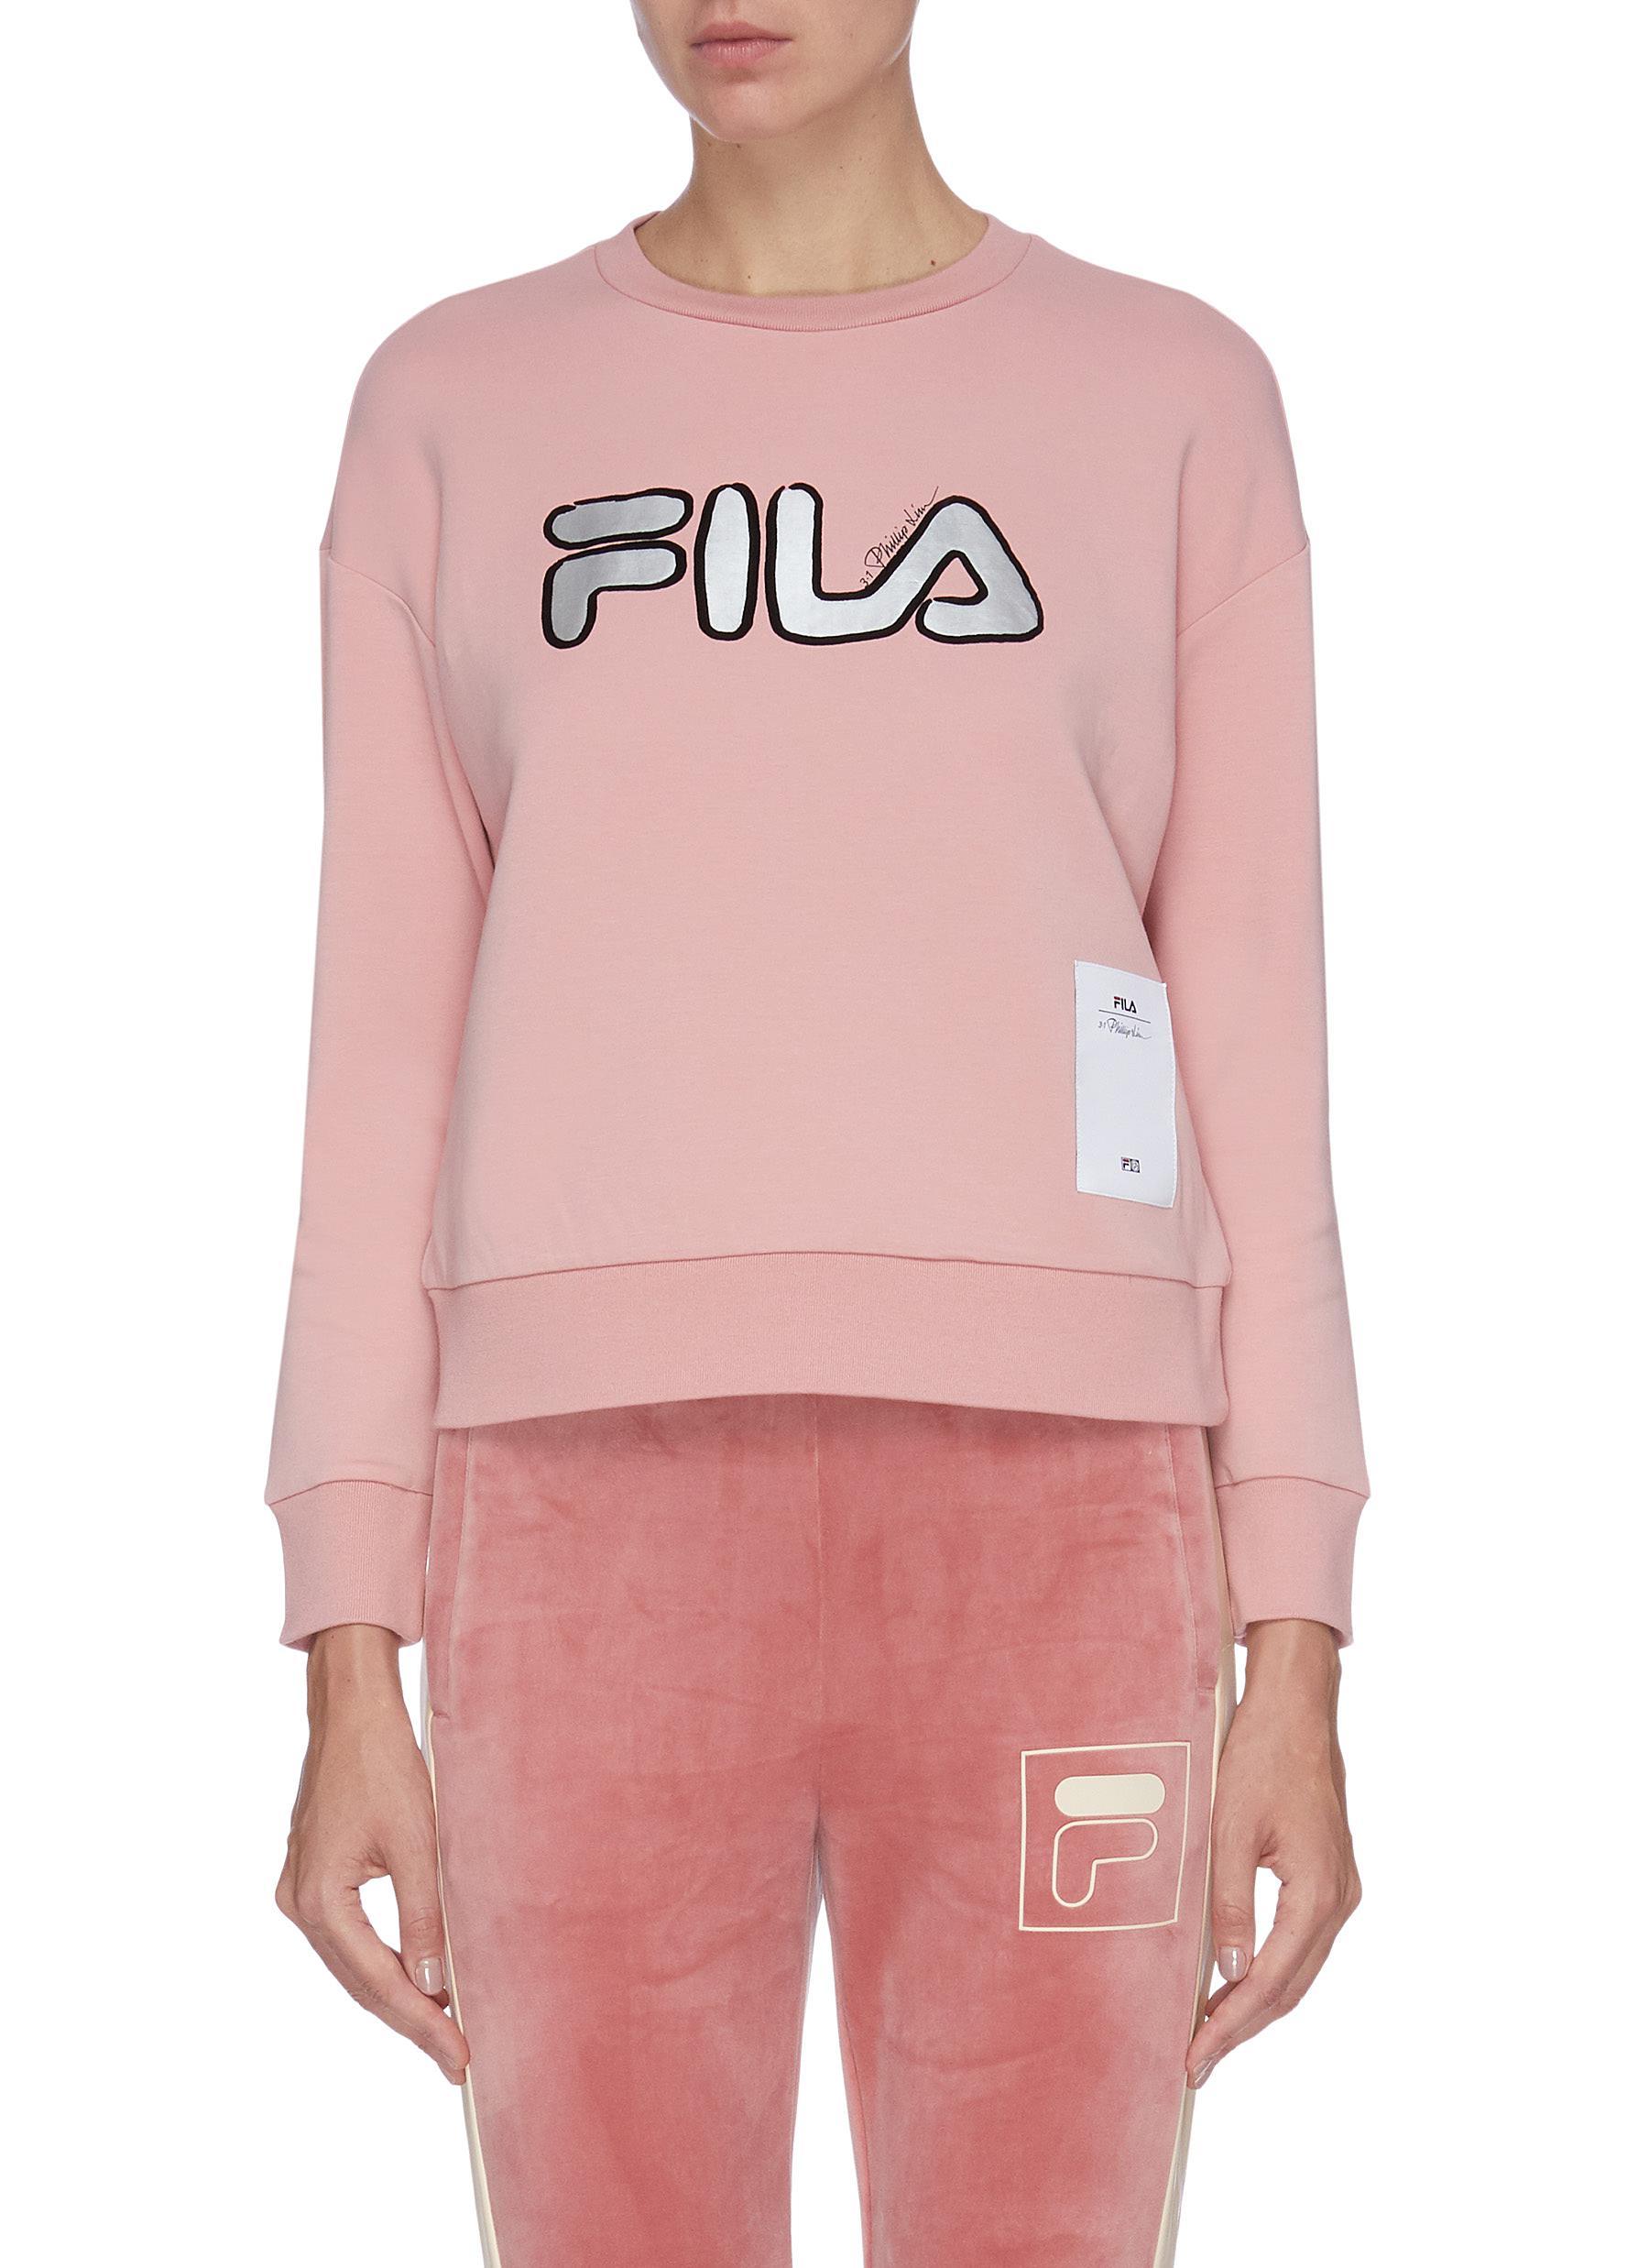 Buy Fila X 3.1 Phillip Lim Tops Patch embroidered contrast logo print sweatshirt